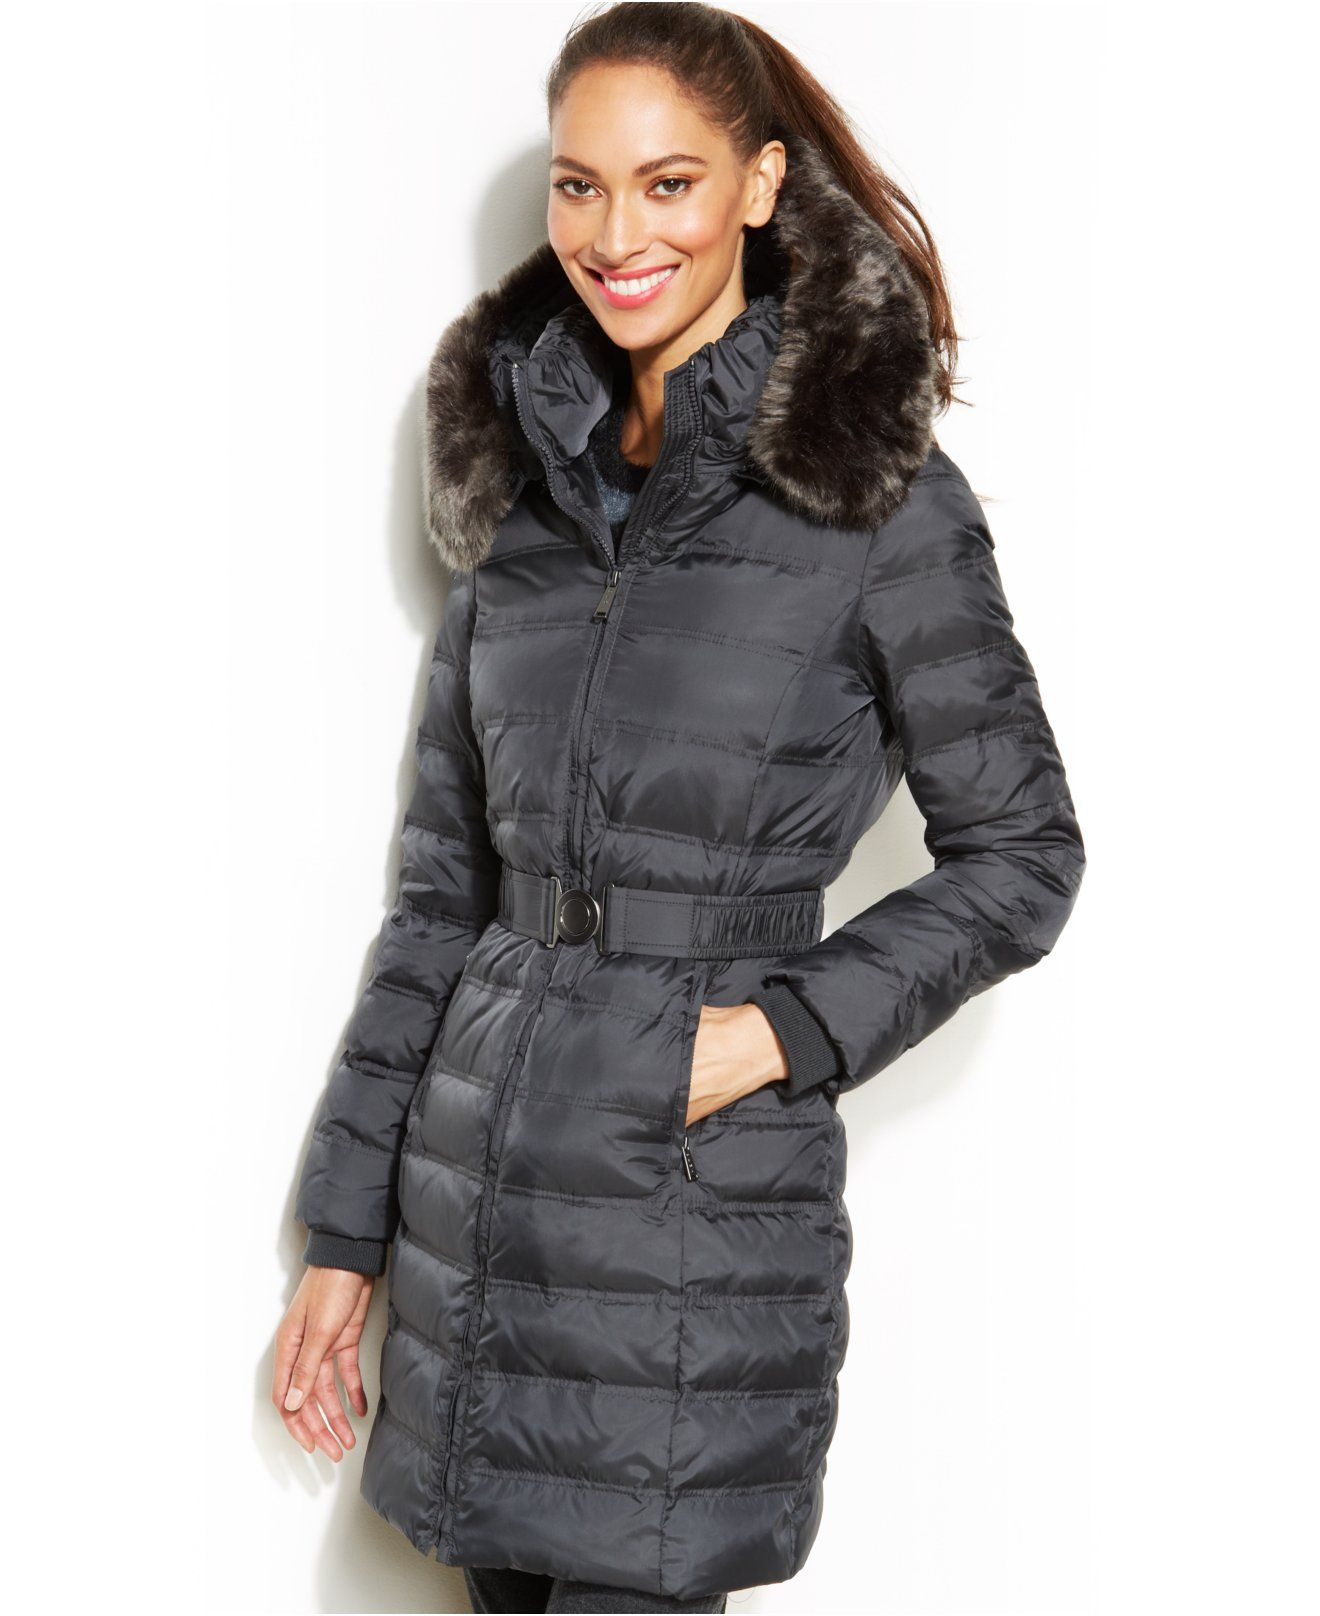 Dkny Hooded Faux Fur Trim Belted Down Puffer Coat Coats Women Macy S Down Puffer Coat Stylish Winter Coats Coats For Women [ 1616 x 1320 Pixel ]